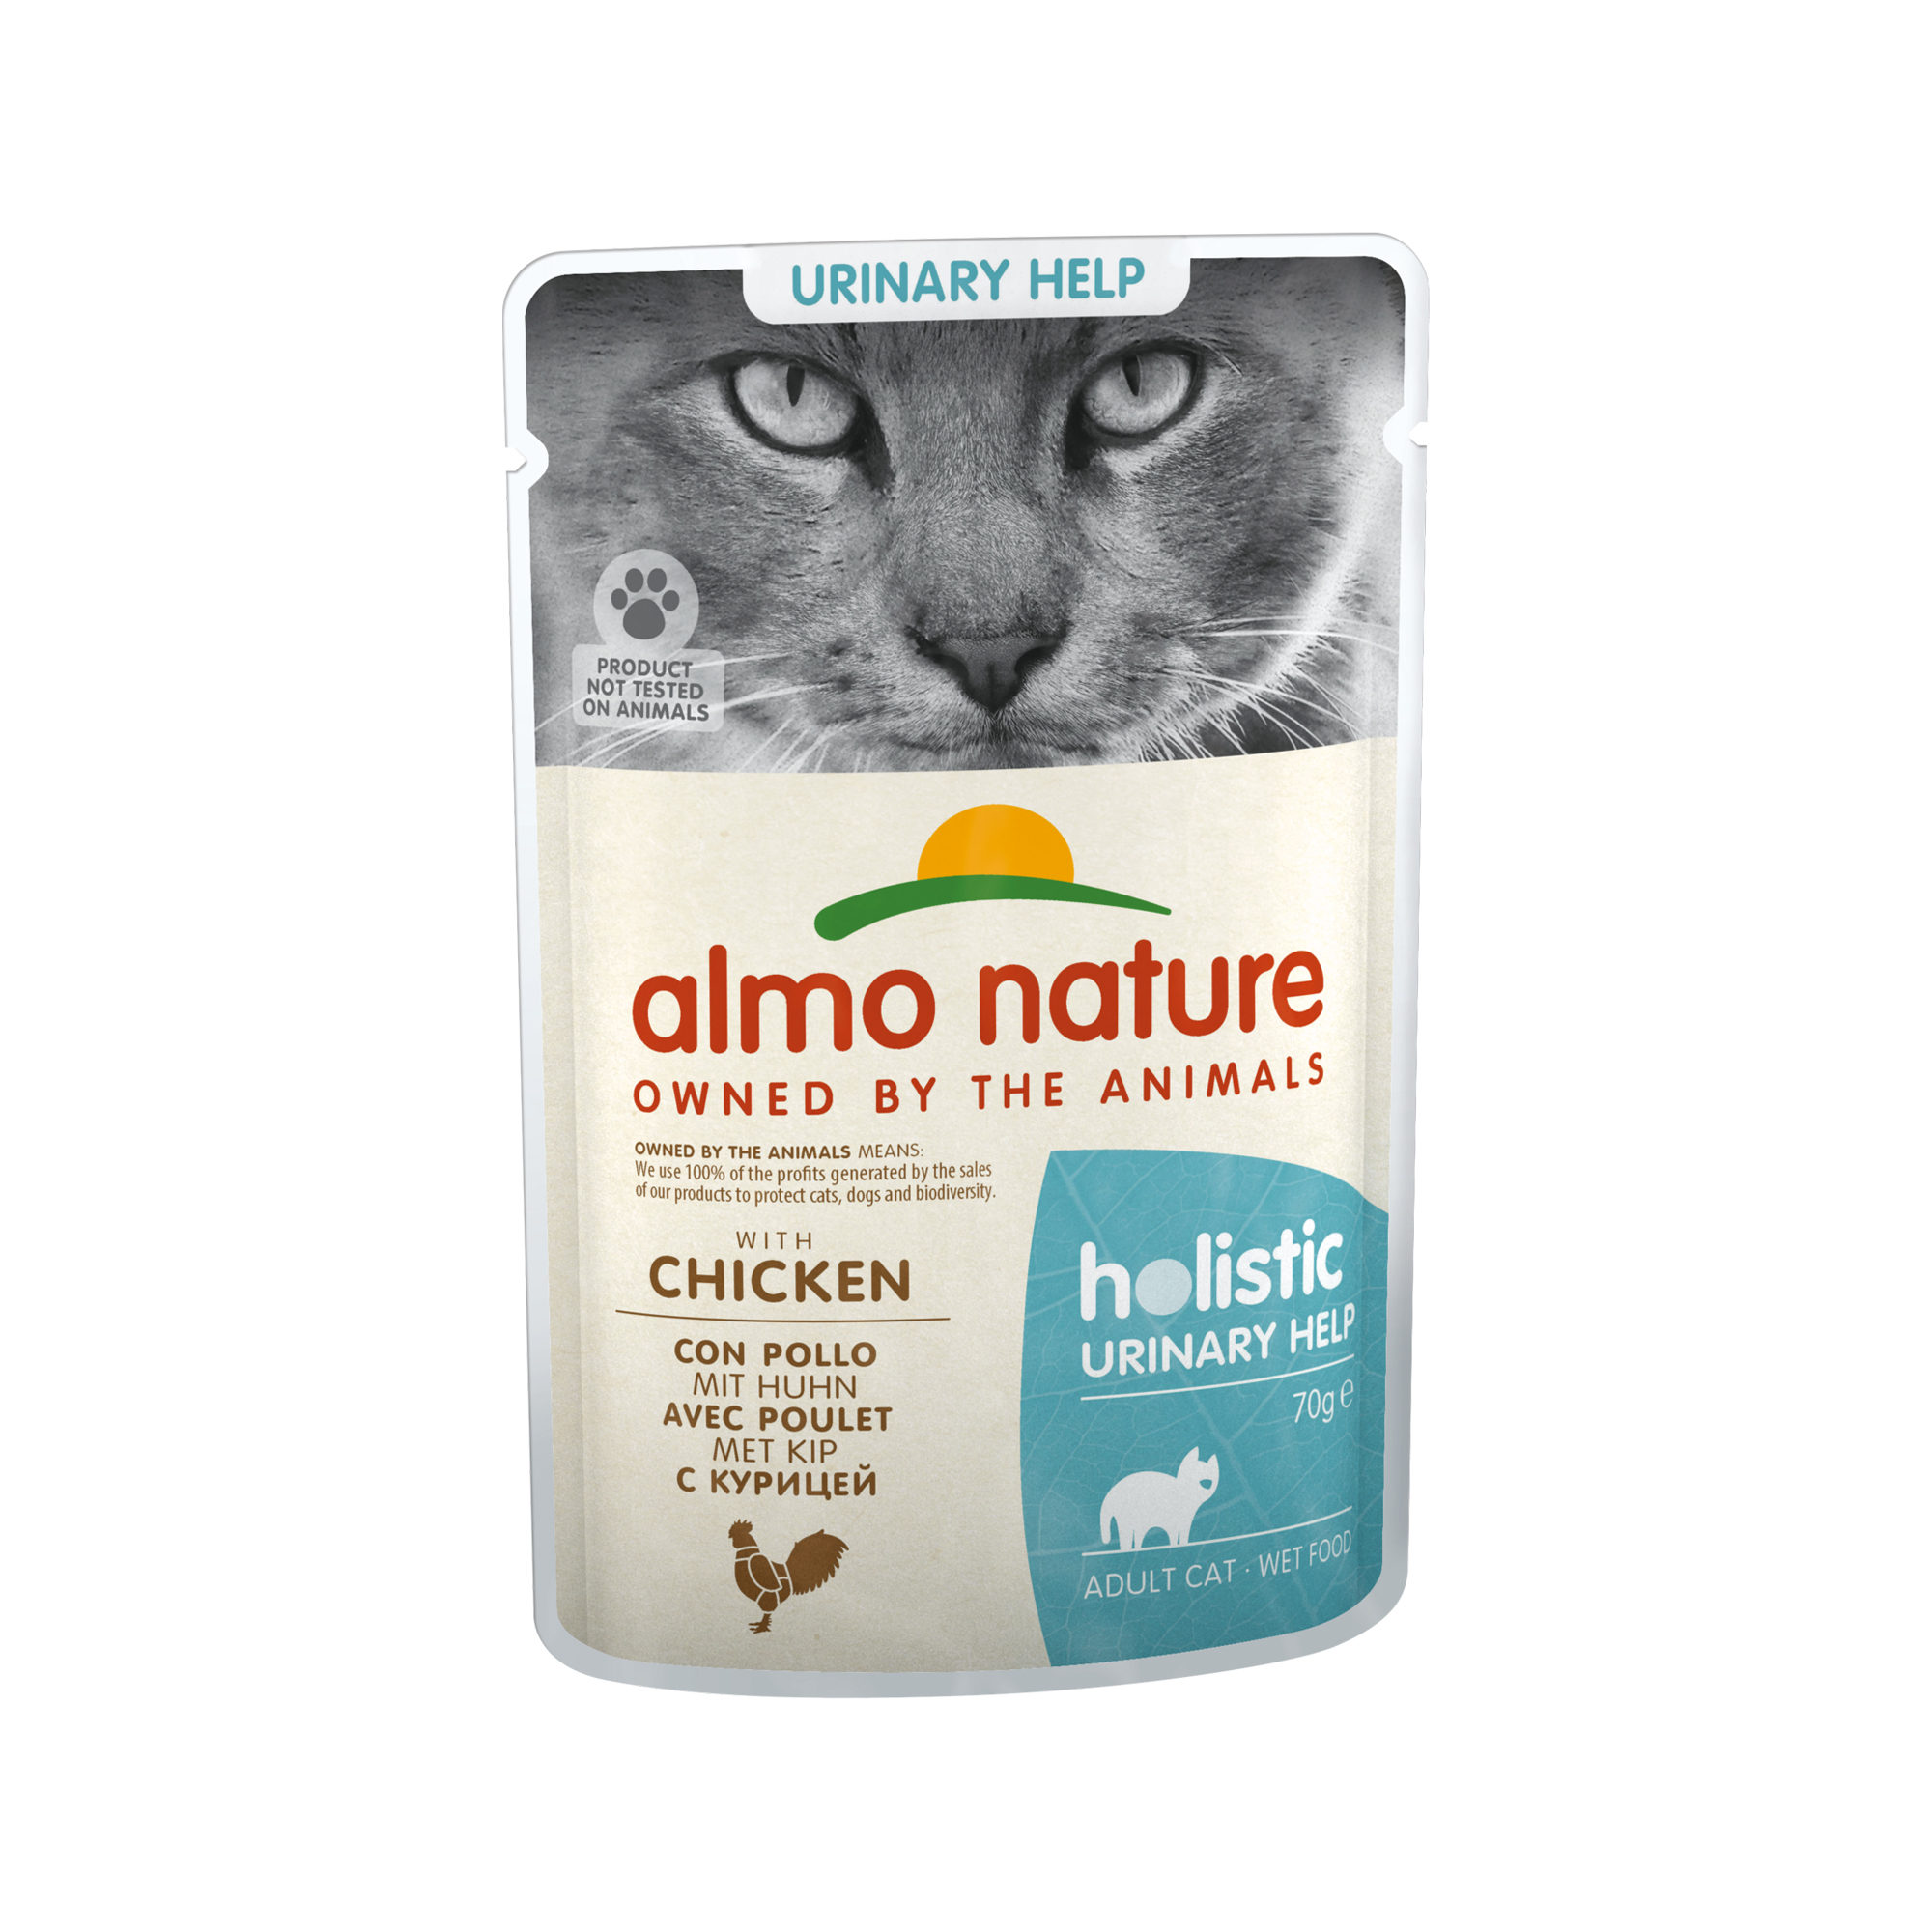 Almo Nature Holistic Urinary Help Katzenfutter - Frischebeutel - Huhn - 20 x 70 g